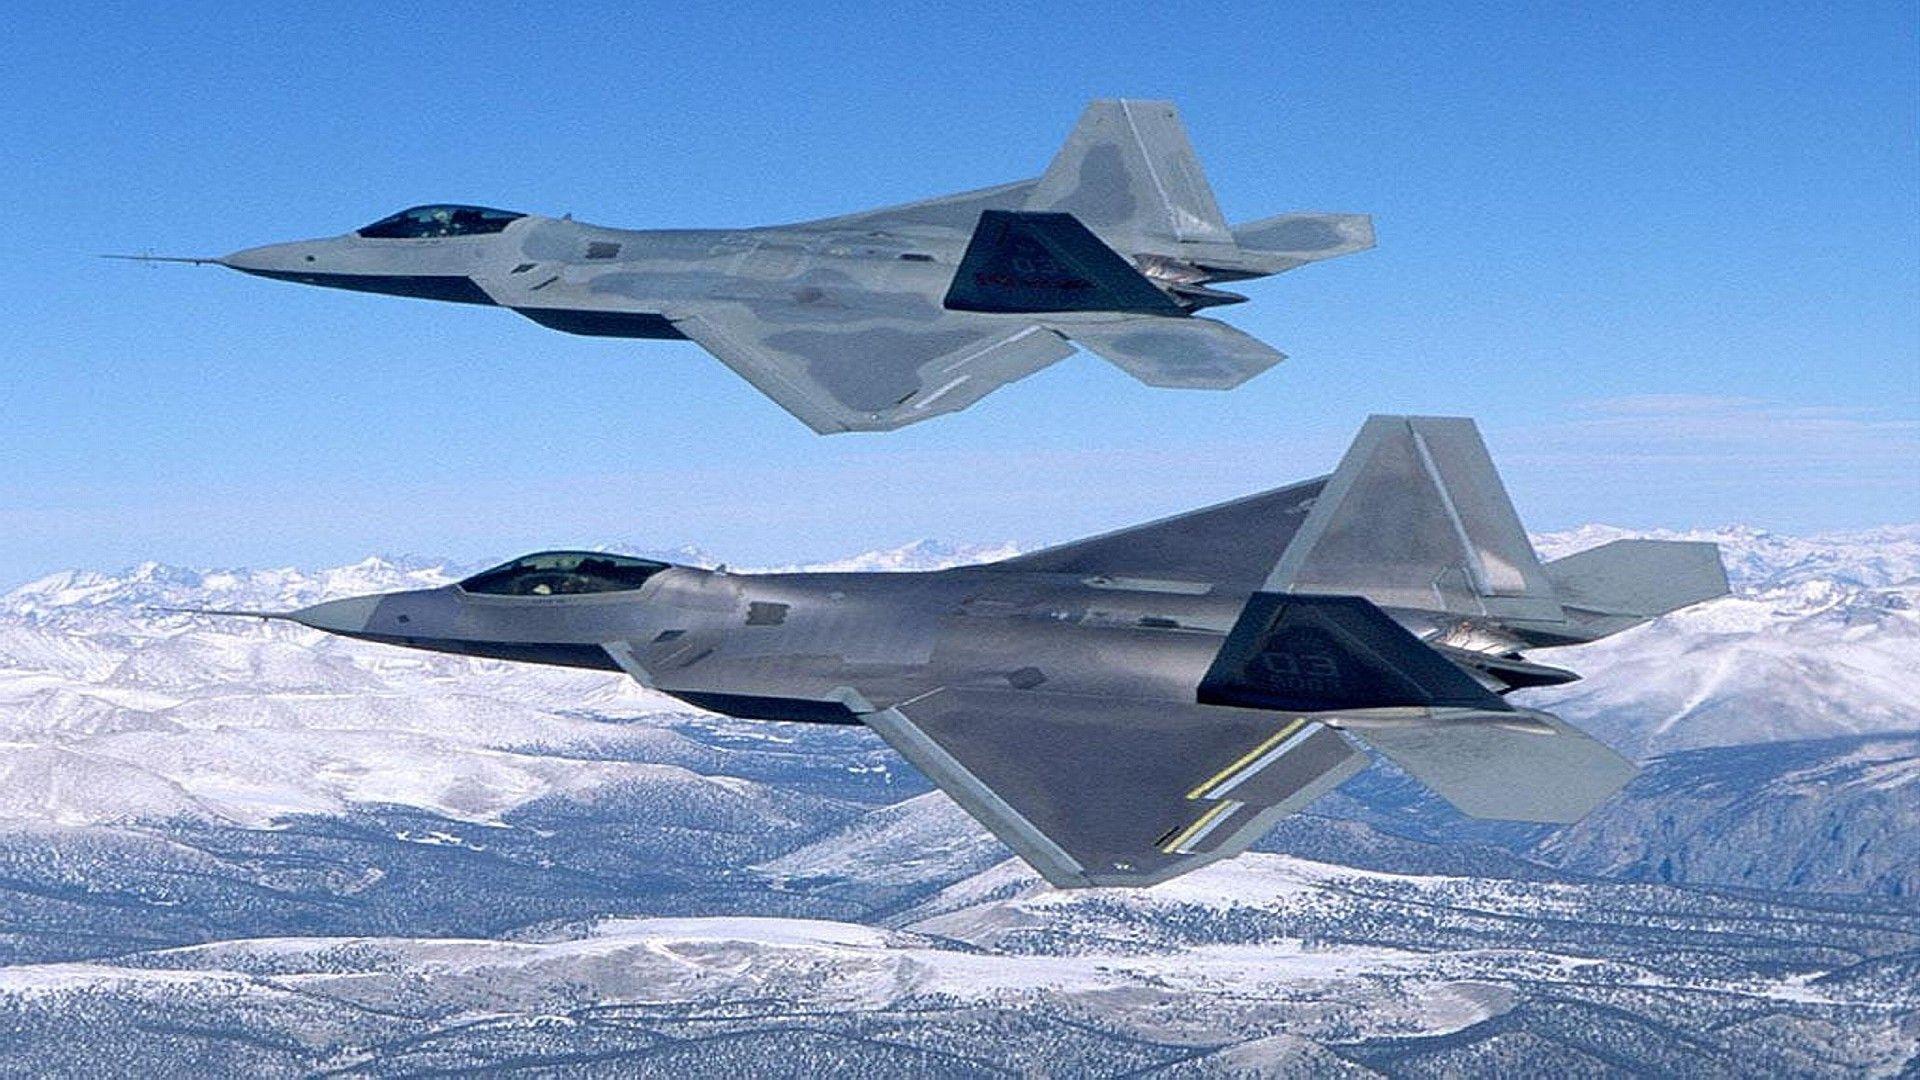 Lockheed Martin F Raptor Desktop Wallpapers Hd 1600 1200 F 22 Wallpapers 38 Wallpapers Adorable Wallpapers Raptors Wallpaper Lockheed Raptor